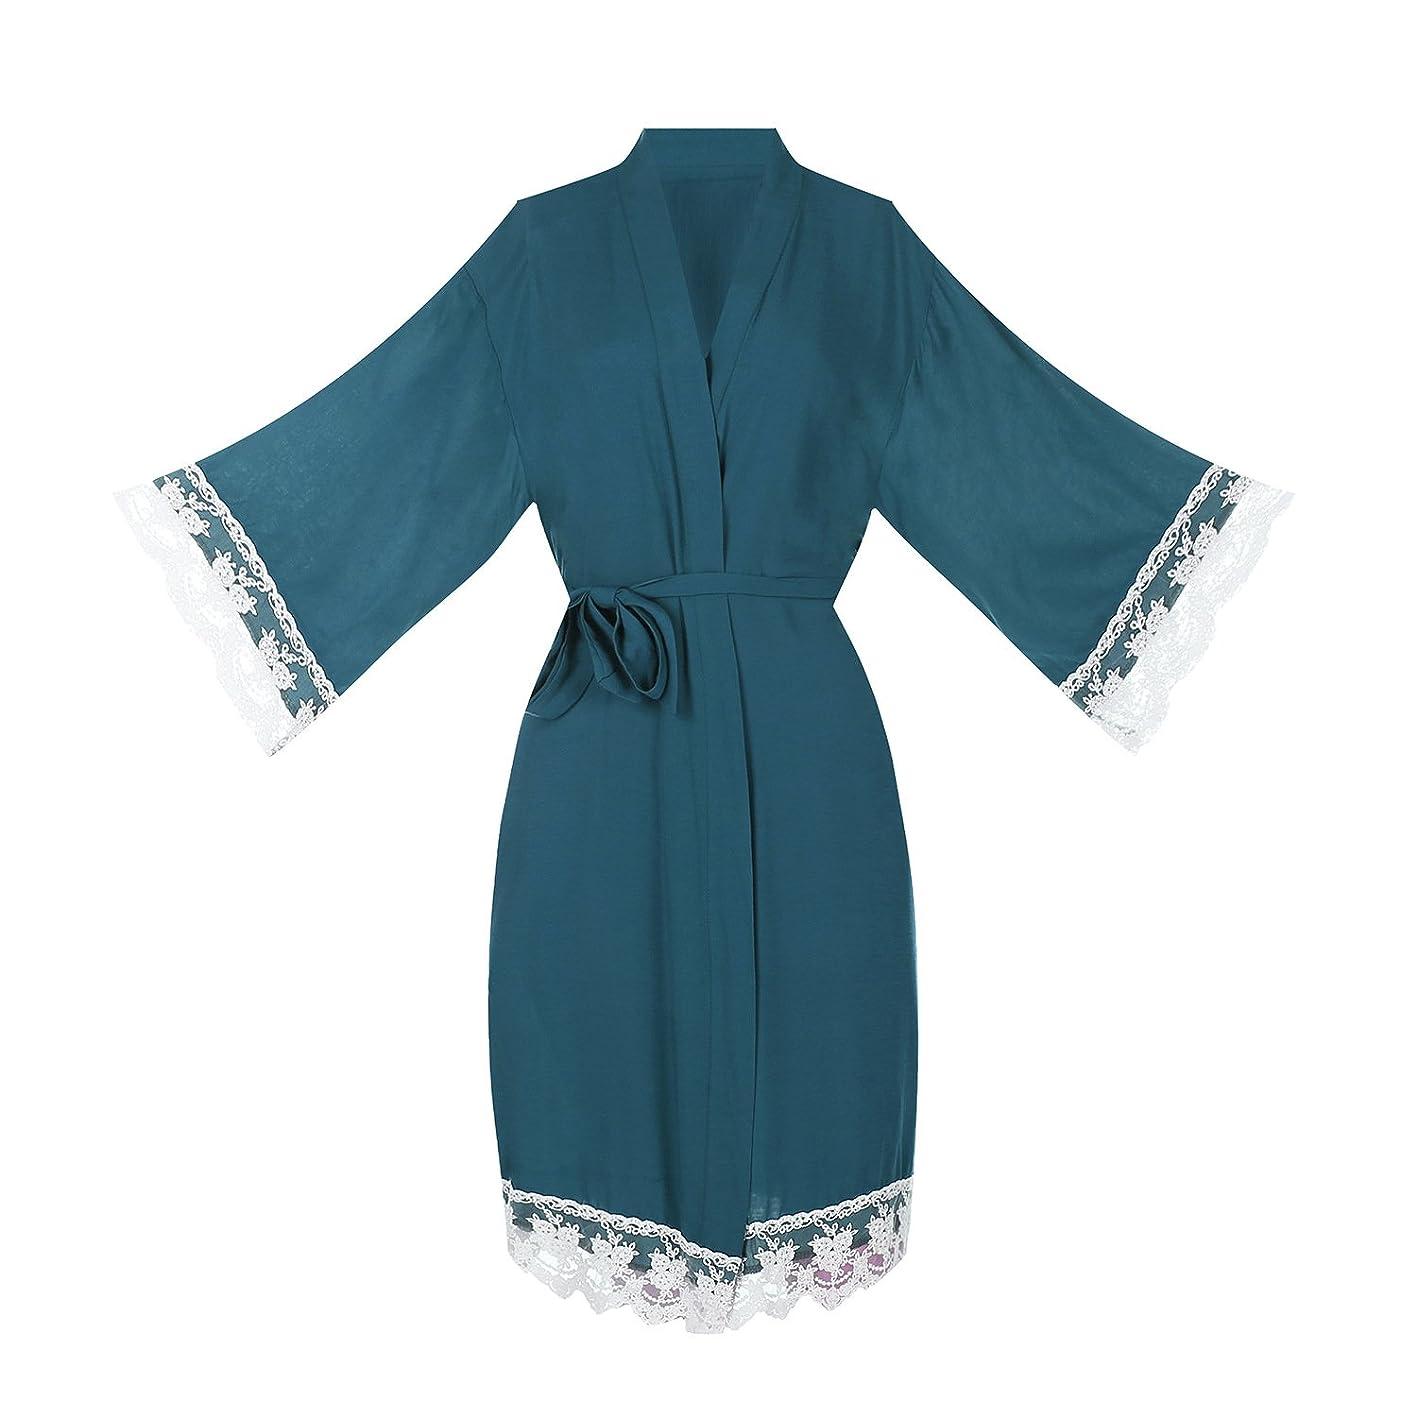 ellenwell Women's Cotton Knit Kimono Robe for Bride and Bridesmaid with Lace Trim Nightwear csbjupxlsat556